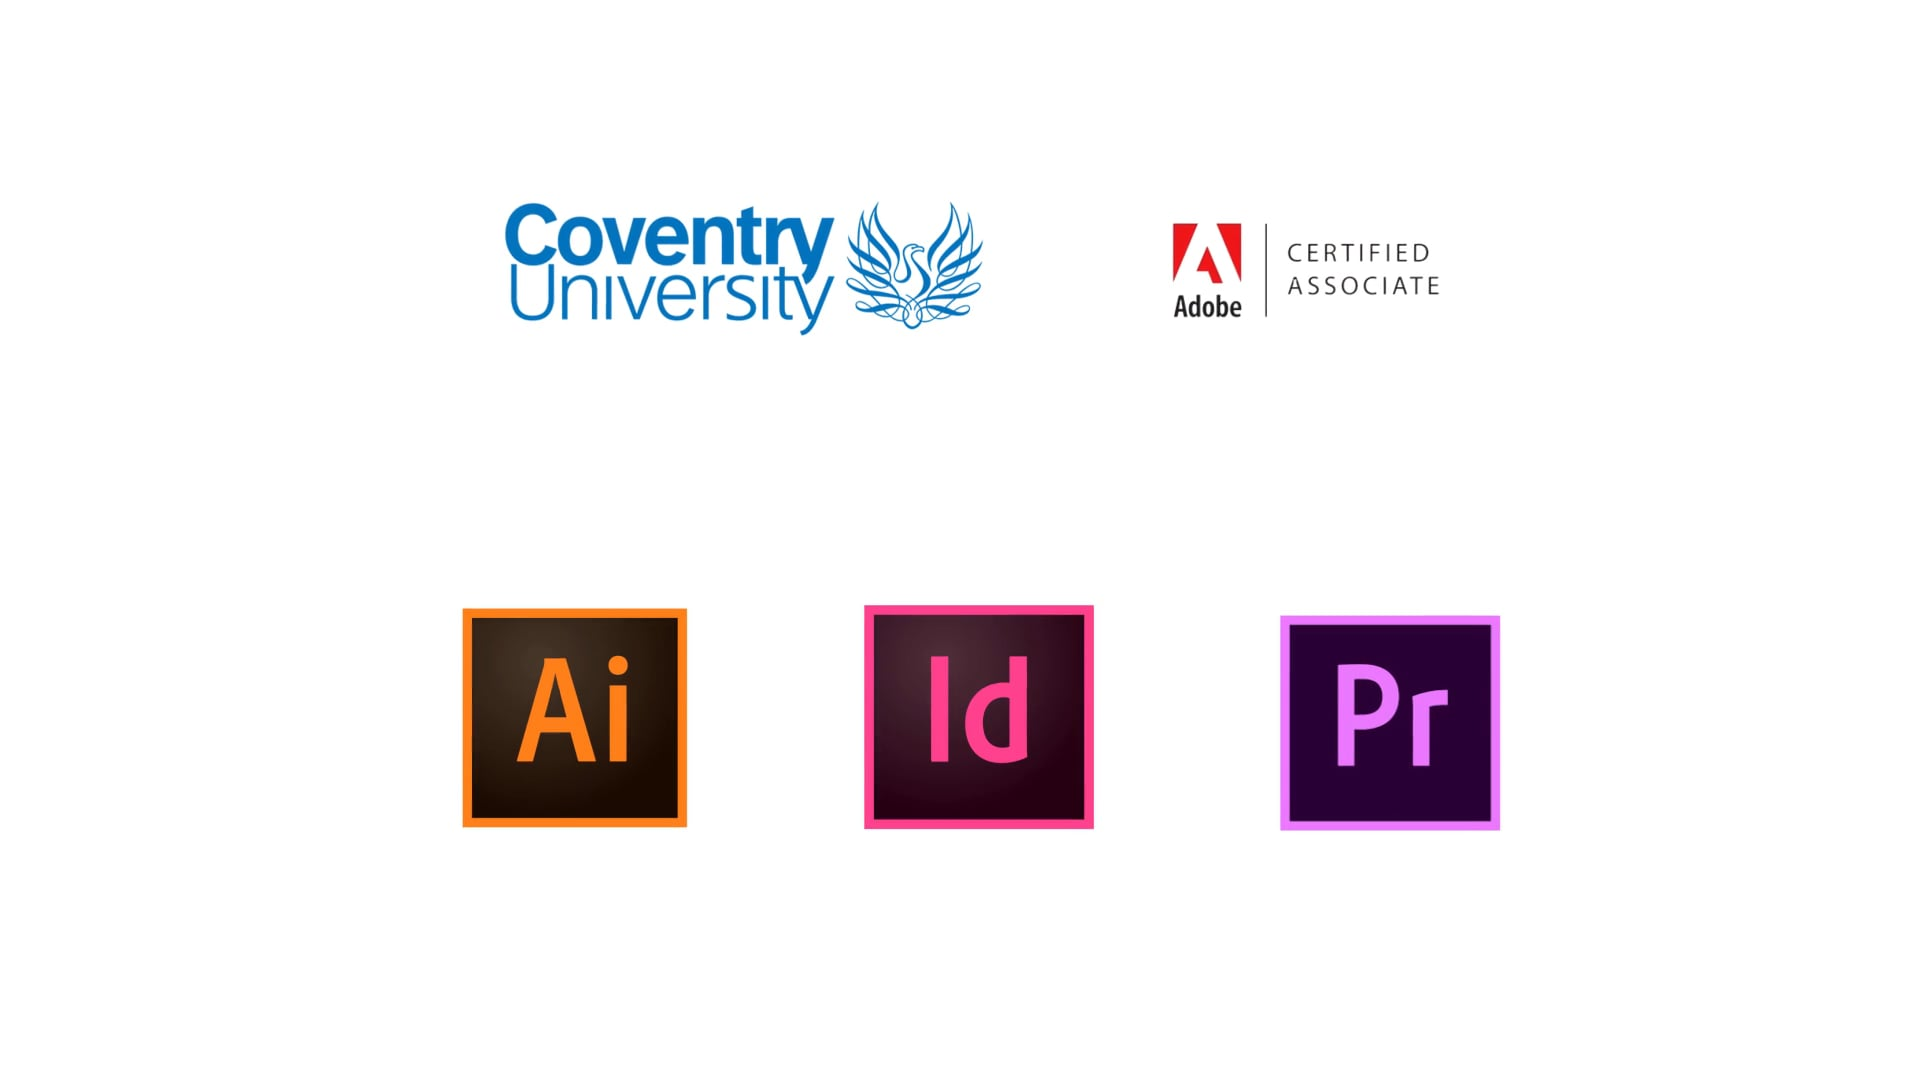 ACA: Adobe Photoshop - Online Course - Advert